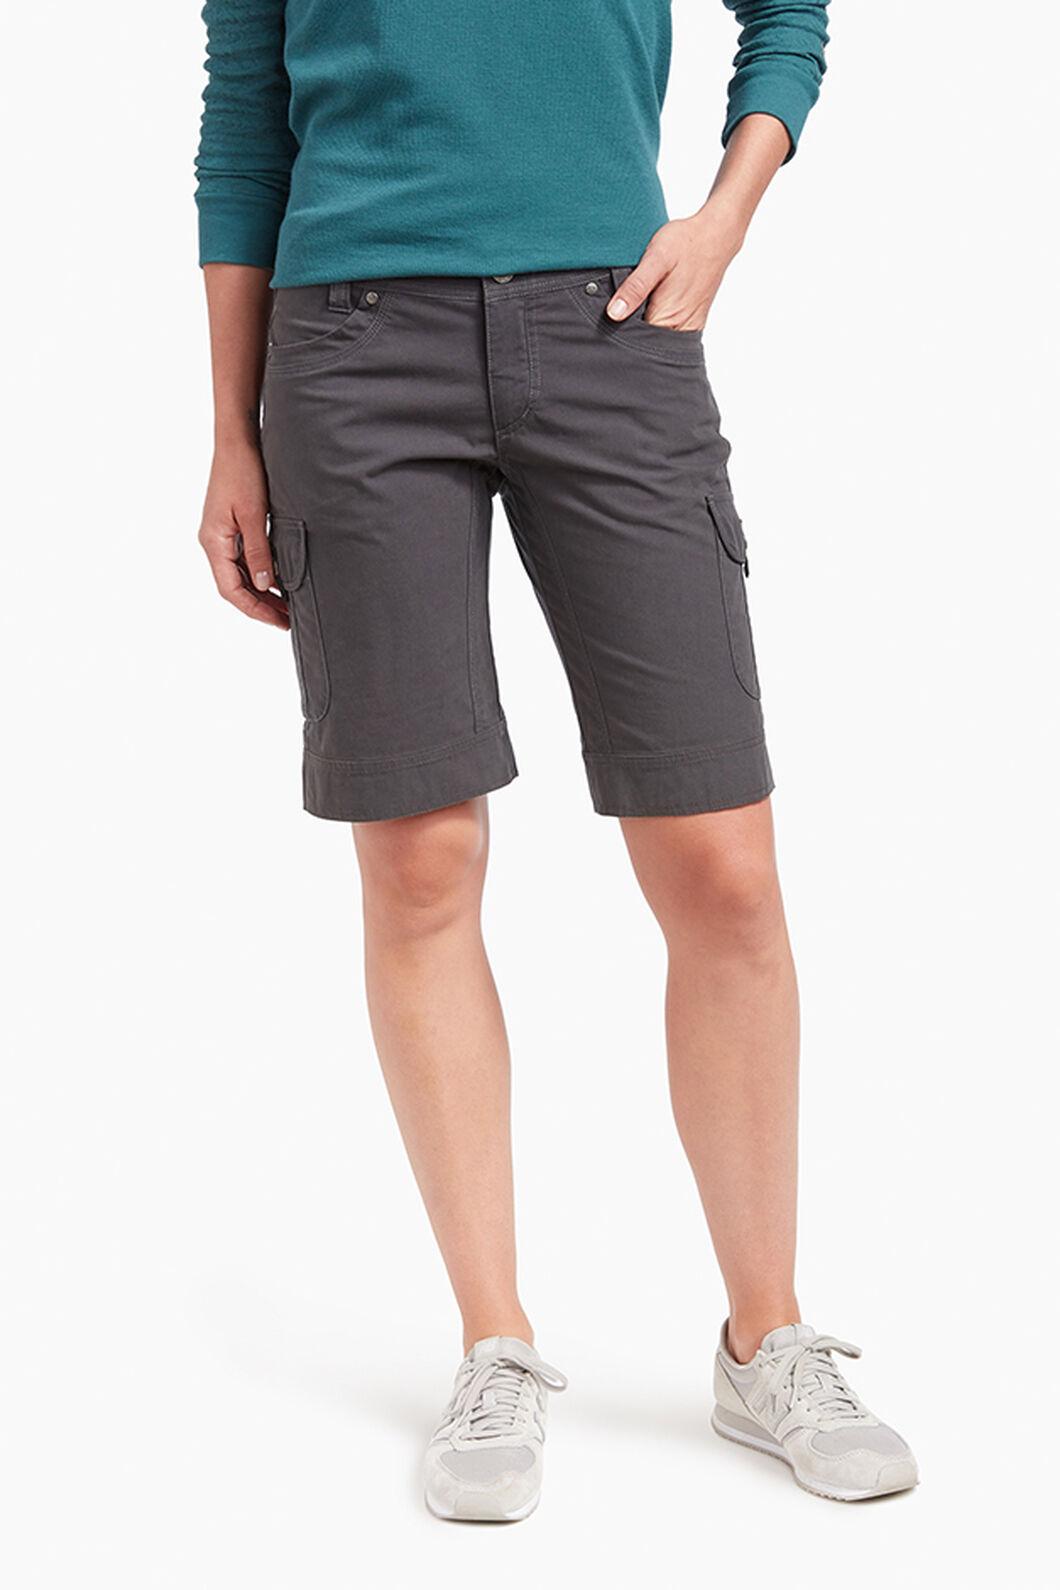 Kuhl Splash™ Shorts — Women's, Ink Black, hi-res